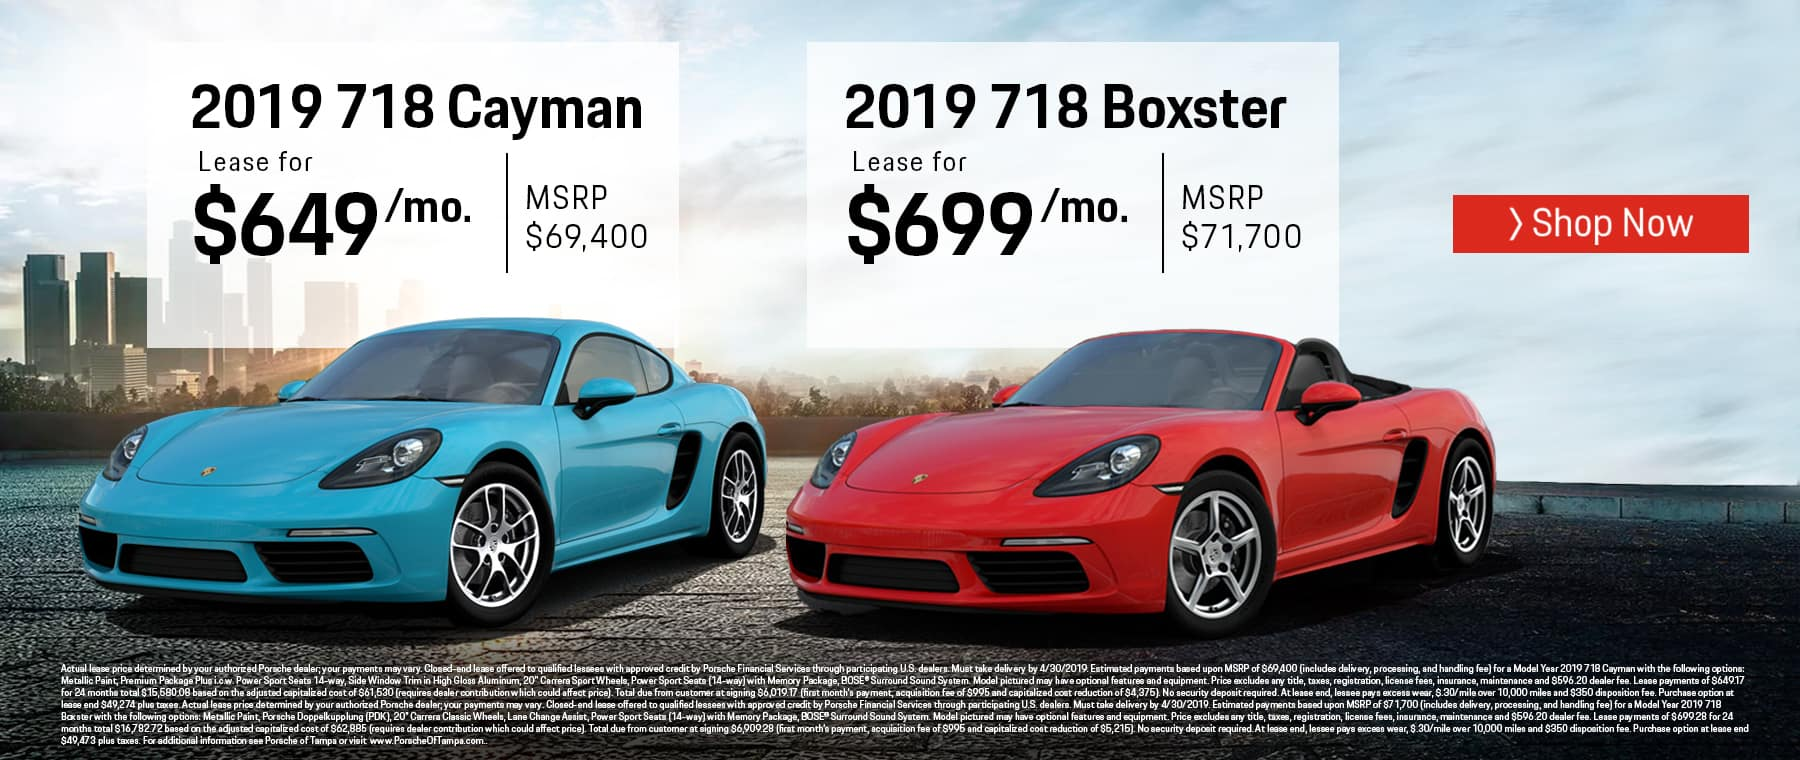 Porsche Cayman and Boxster